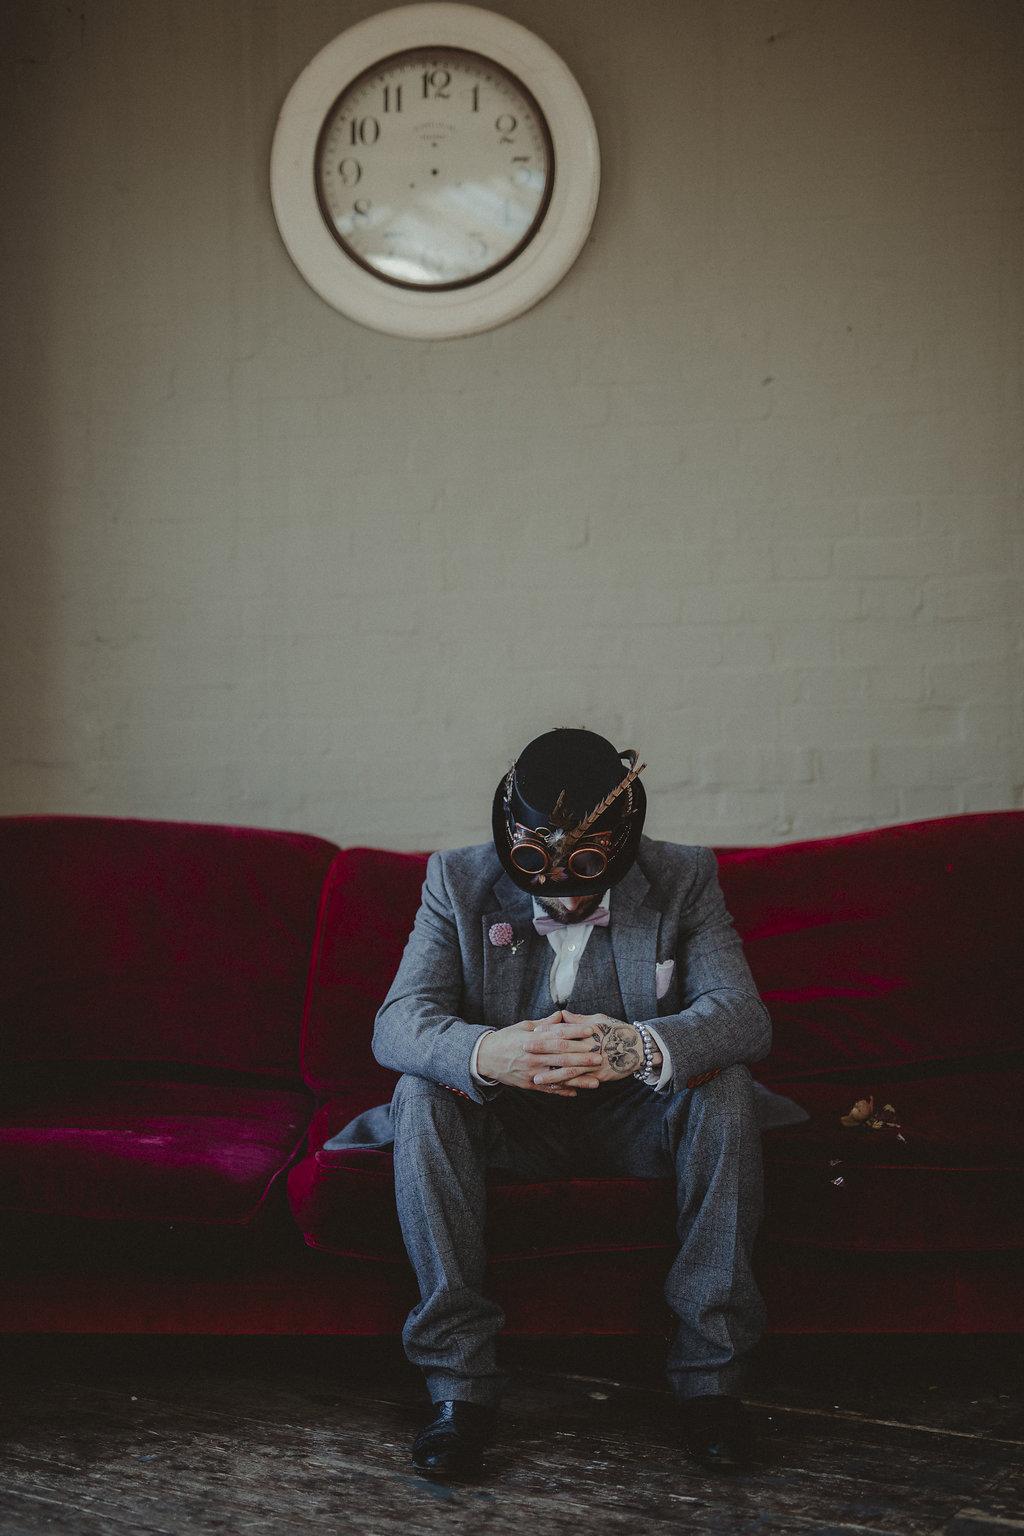 Studio Fotografico Bacci - Steampunk wedding - alternative wedding 48